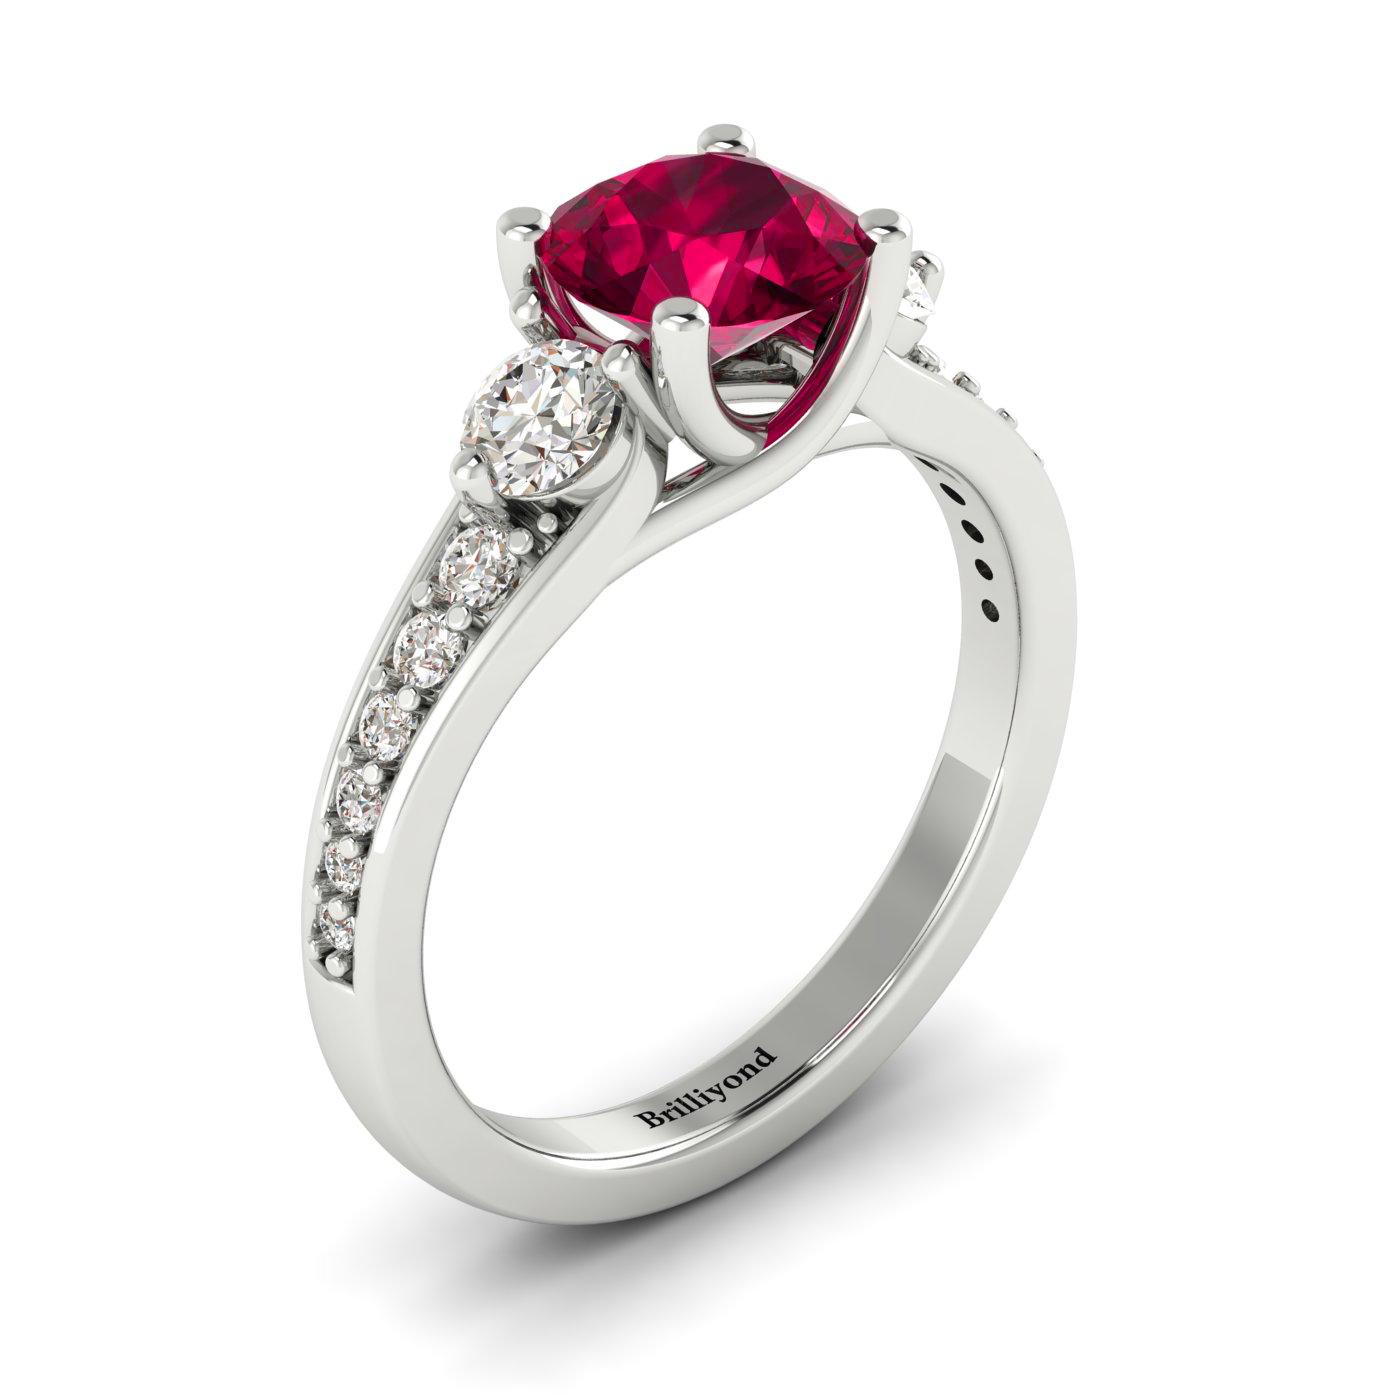 18k White Gold Ruby and Diamonds Three Stone Engagement Ring Sorento